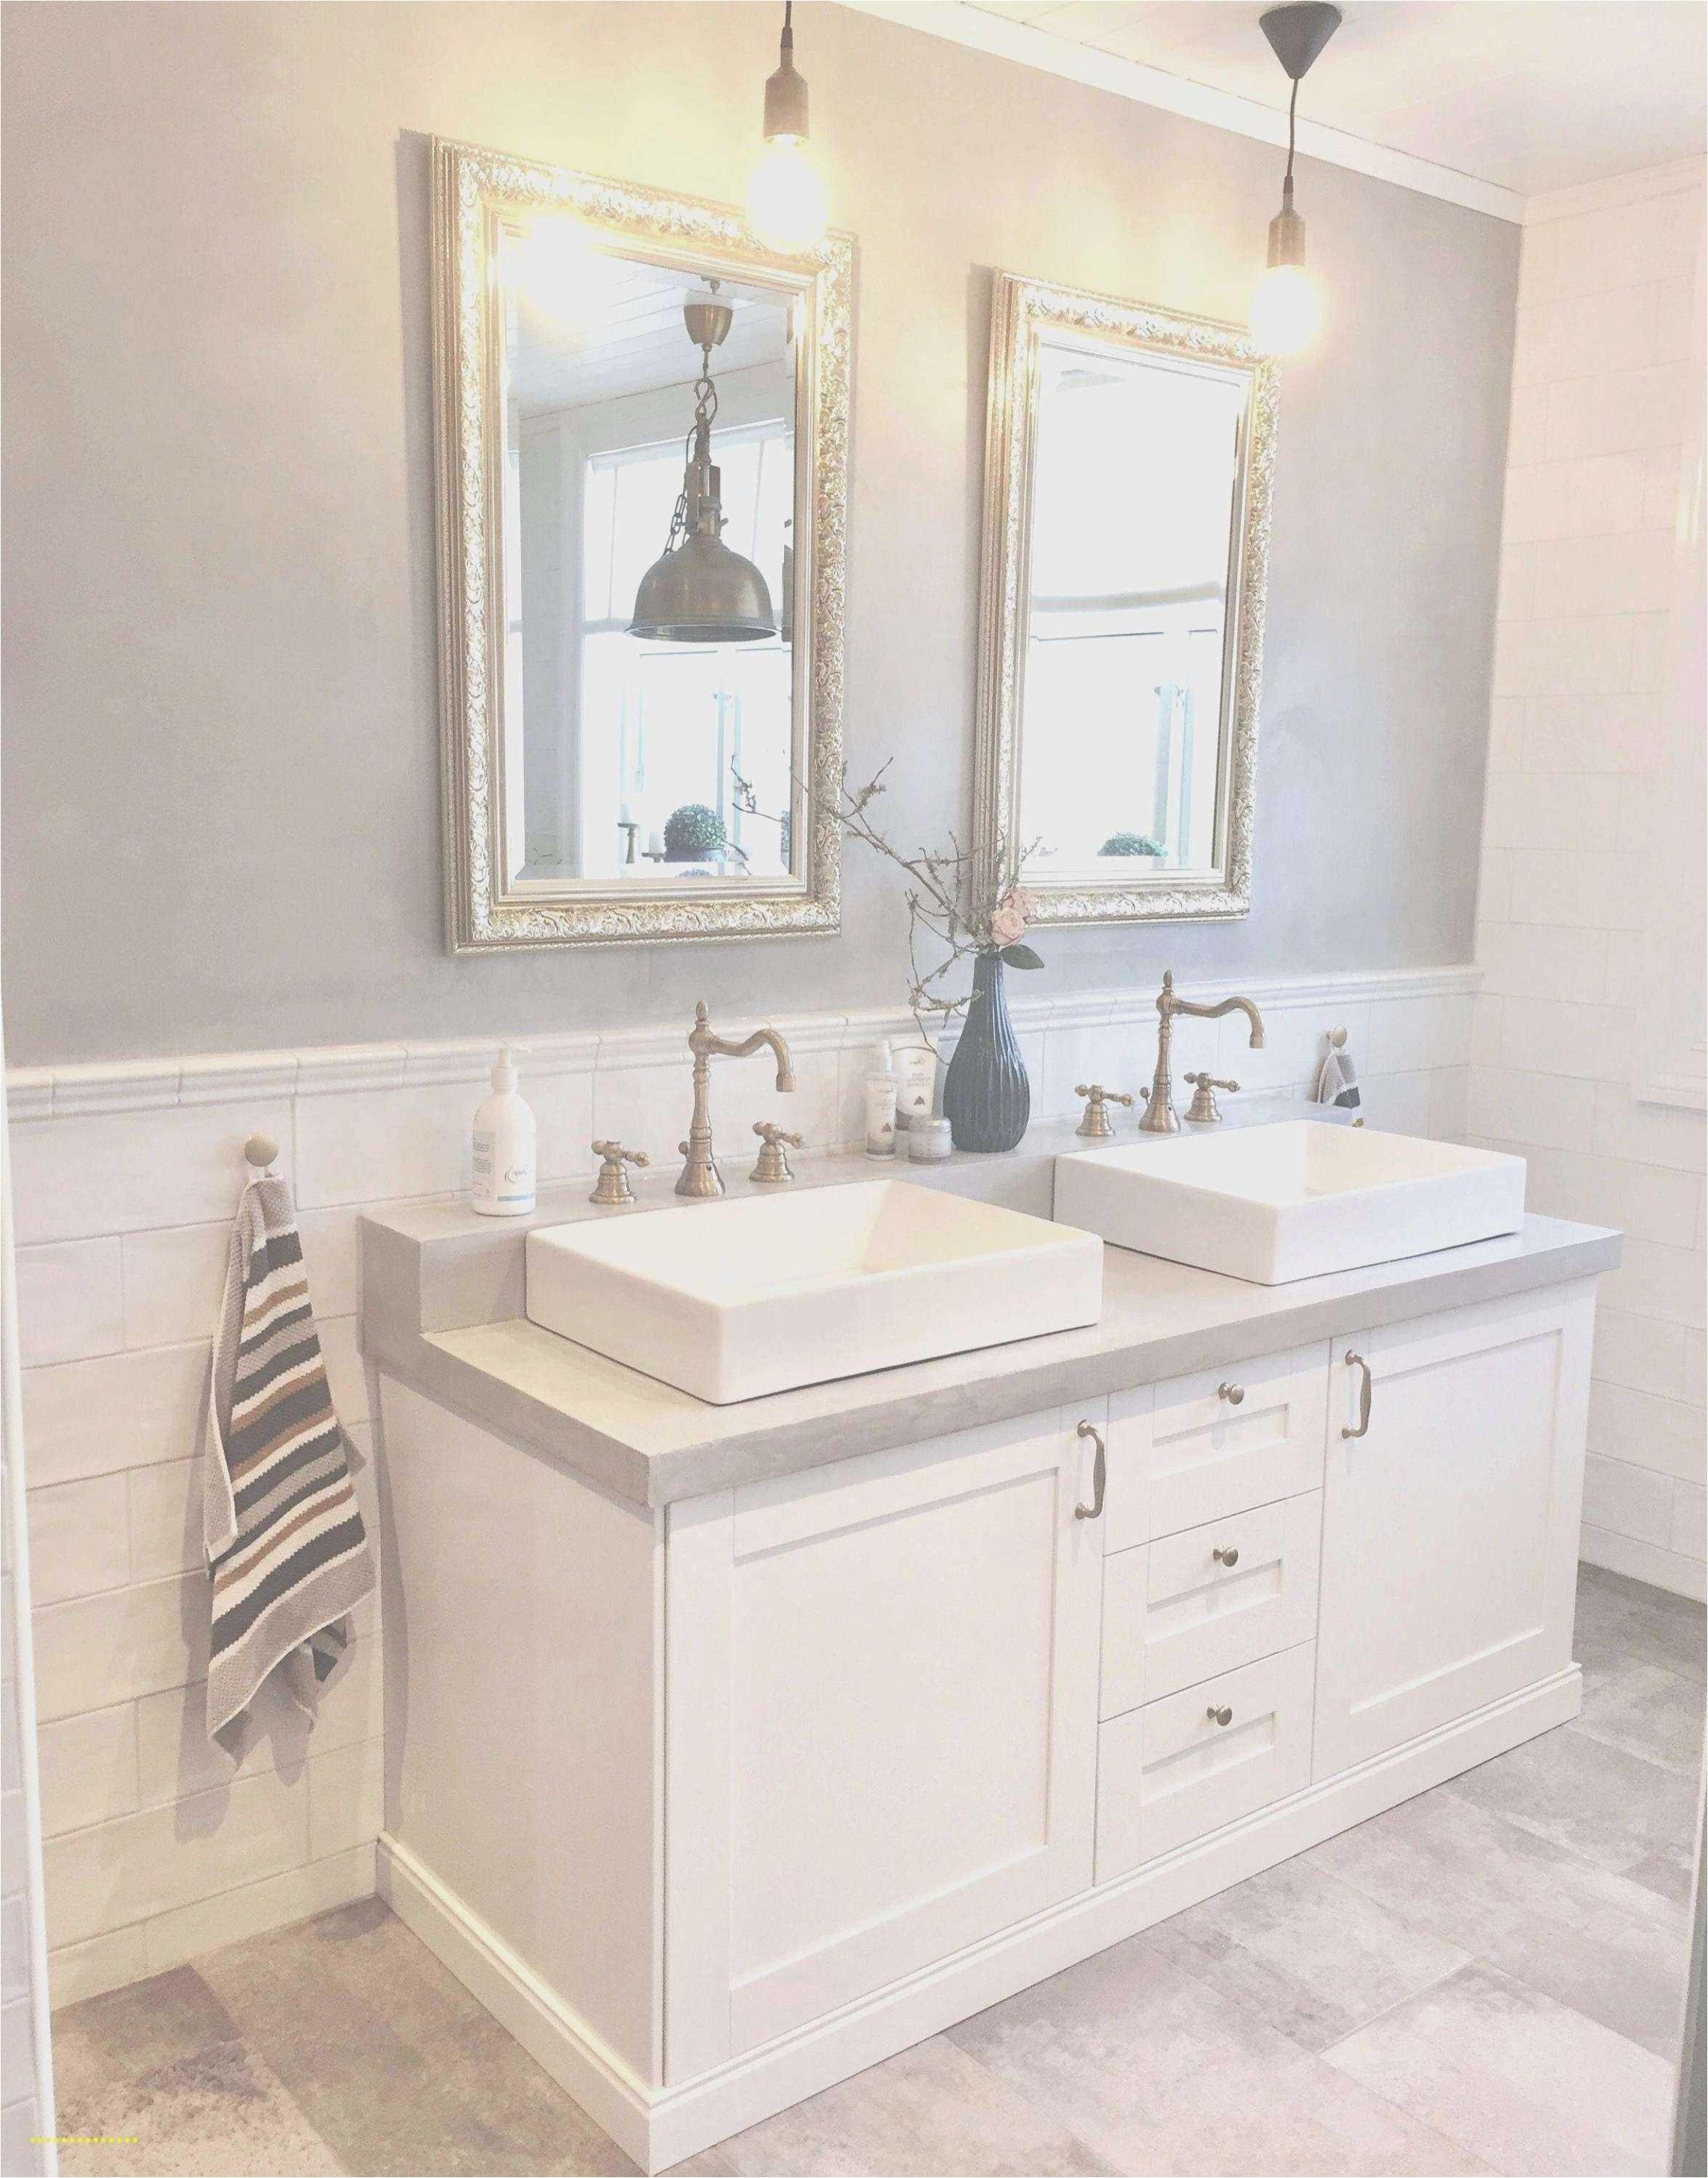 Bathroom Color Scheme Best New Bathroom Color Scheme Ideas – Home Design & Interior Design